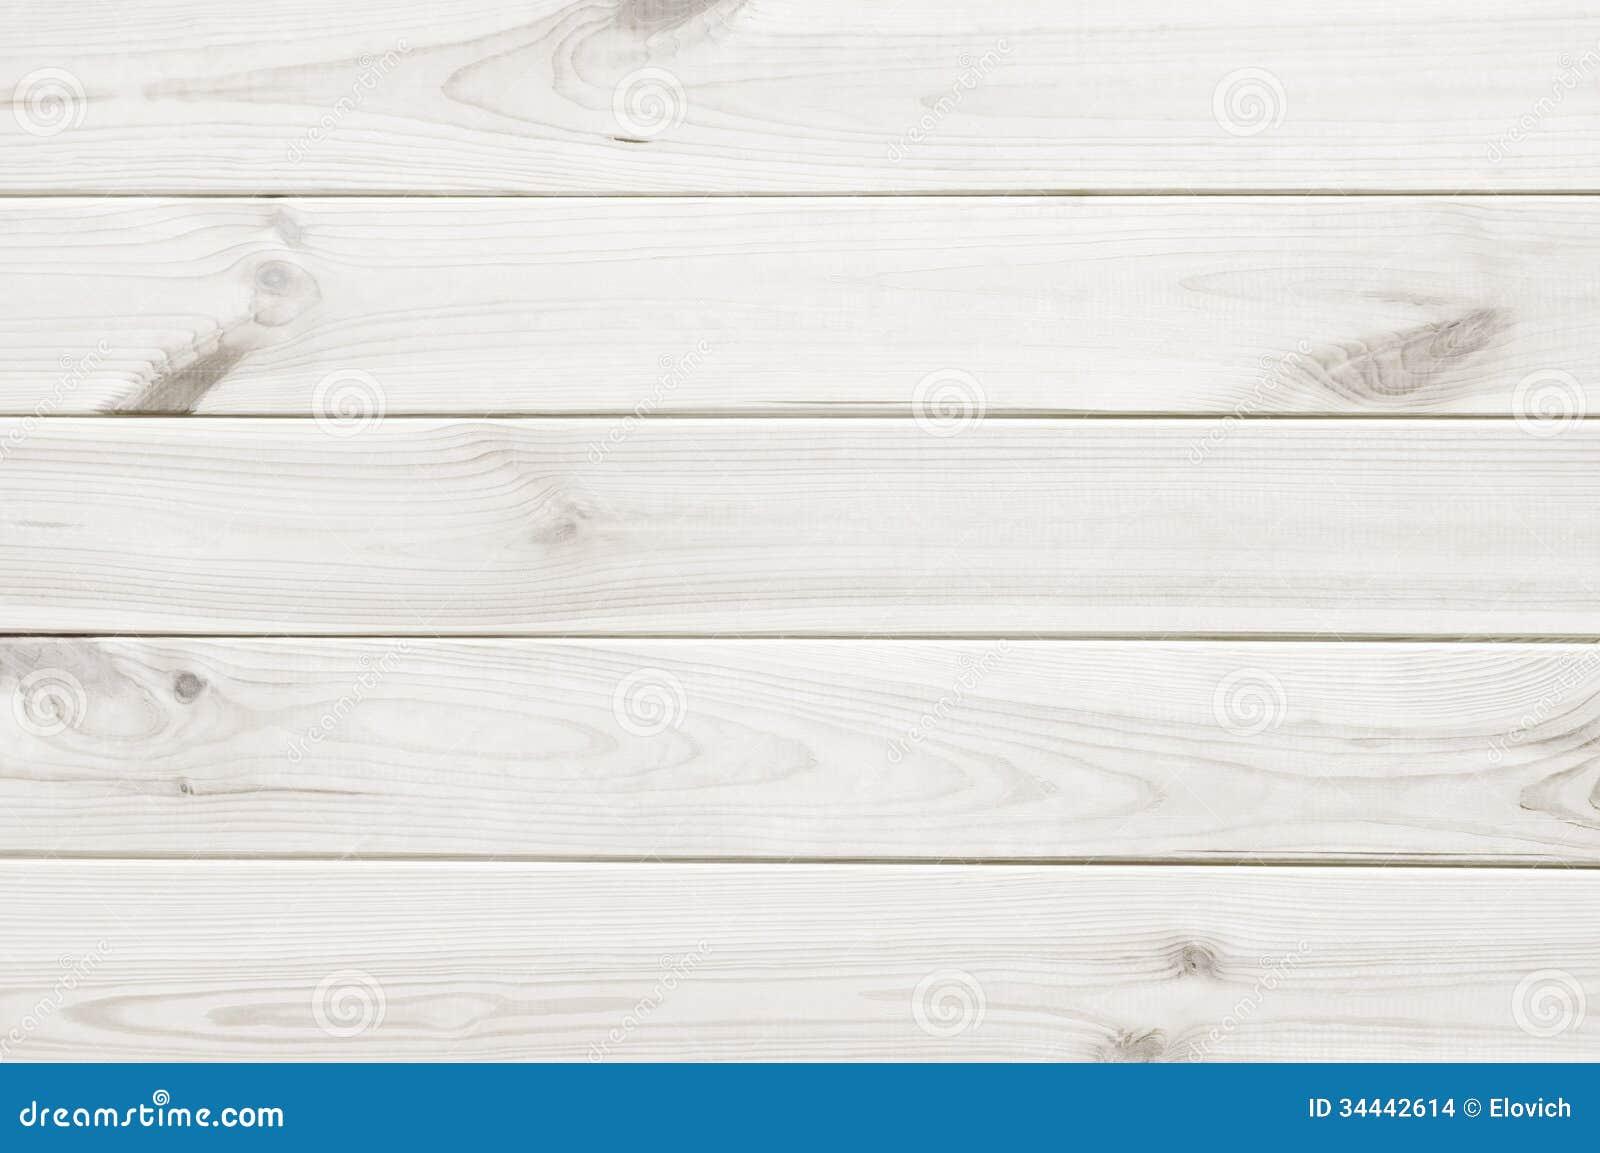 Wood plank white texture background stock images image for Planche de bois blanchi